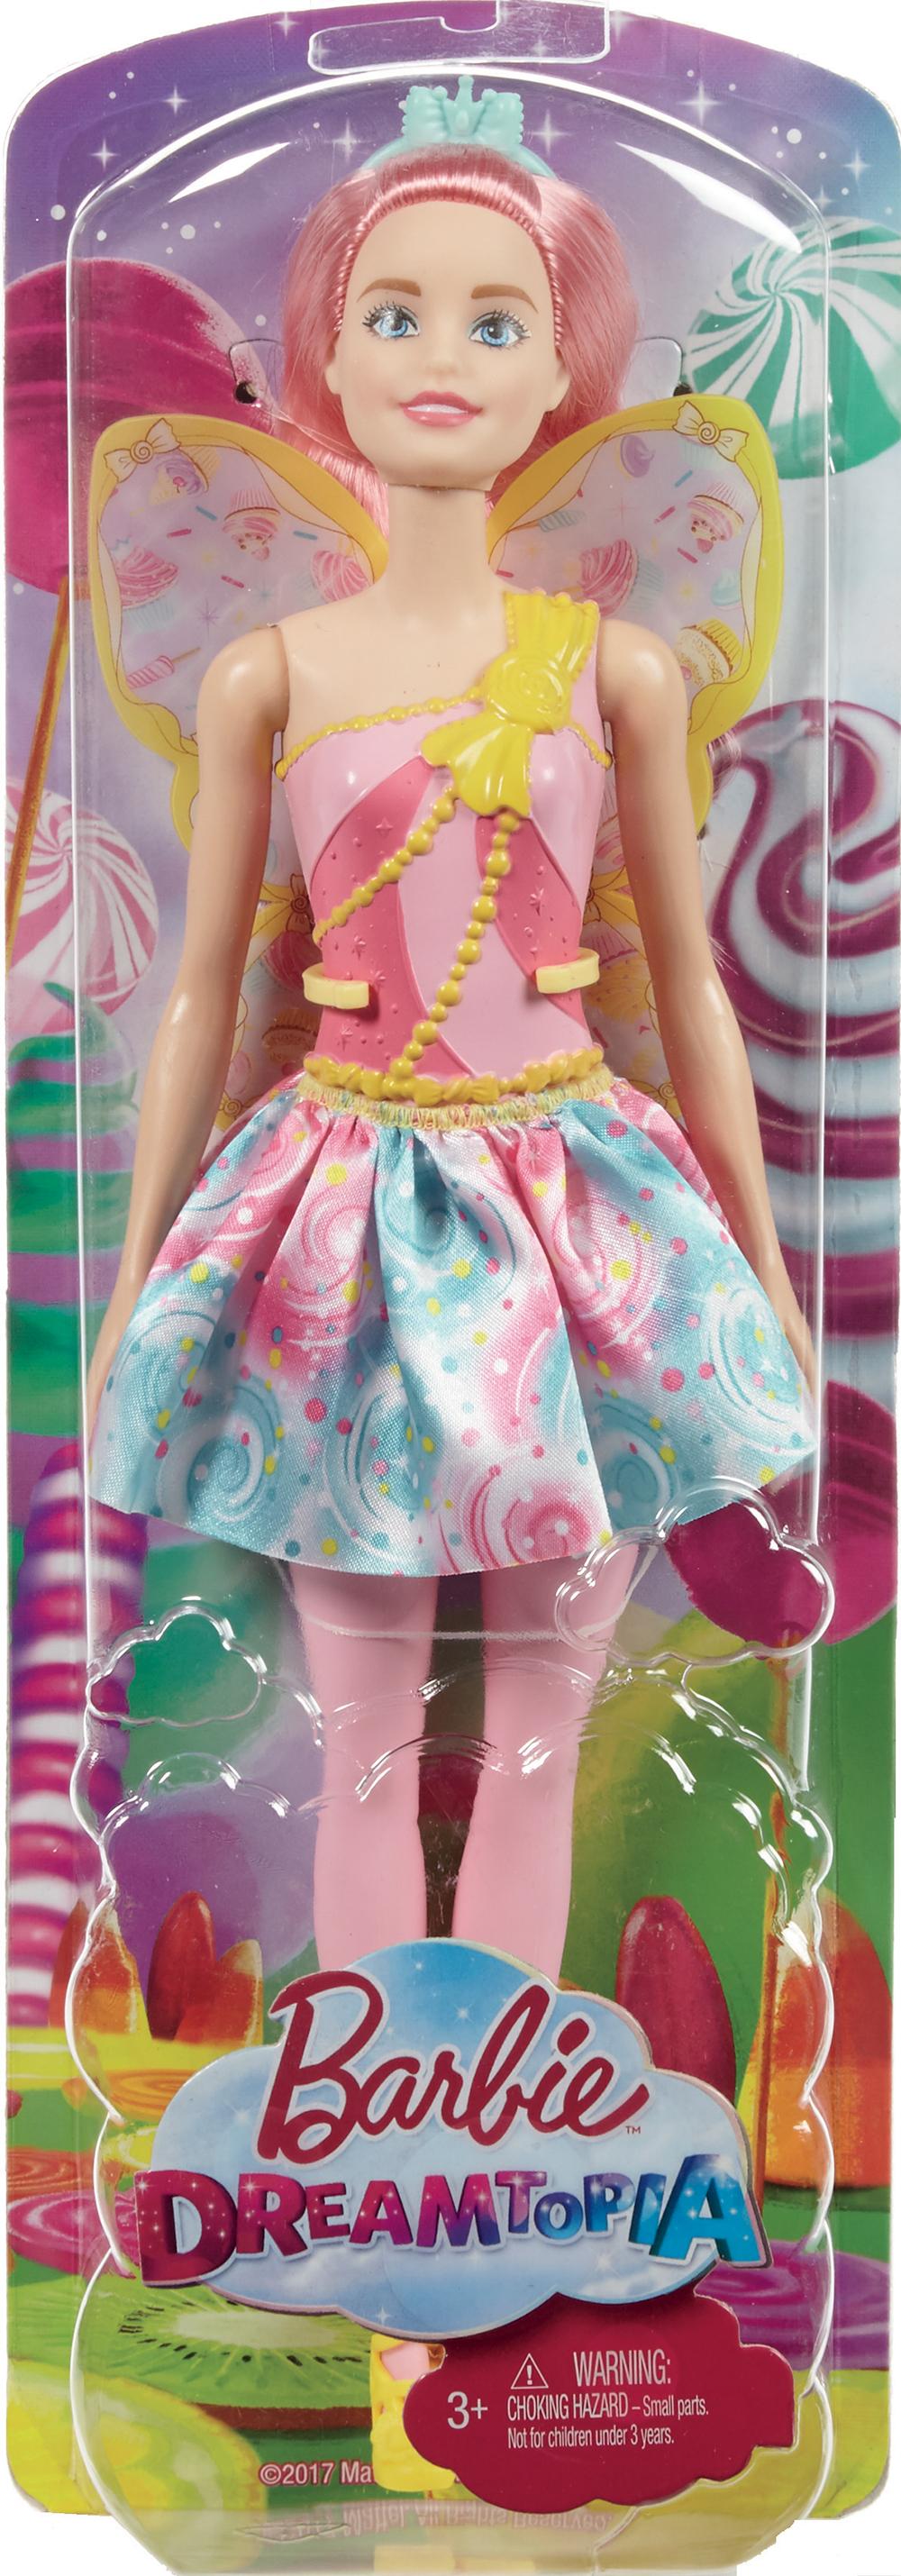 Barbie Dreamtopia - Poupée Fée assortie